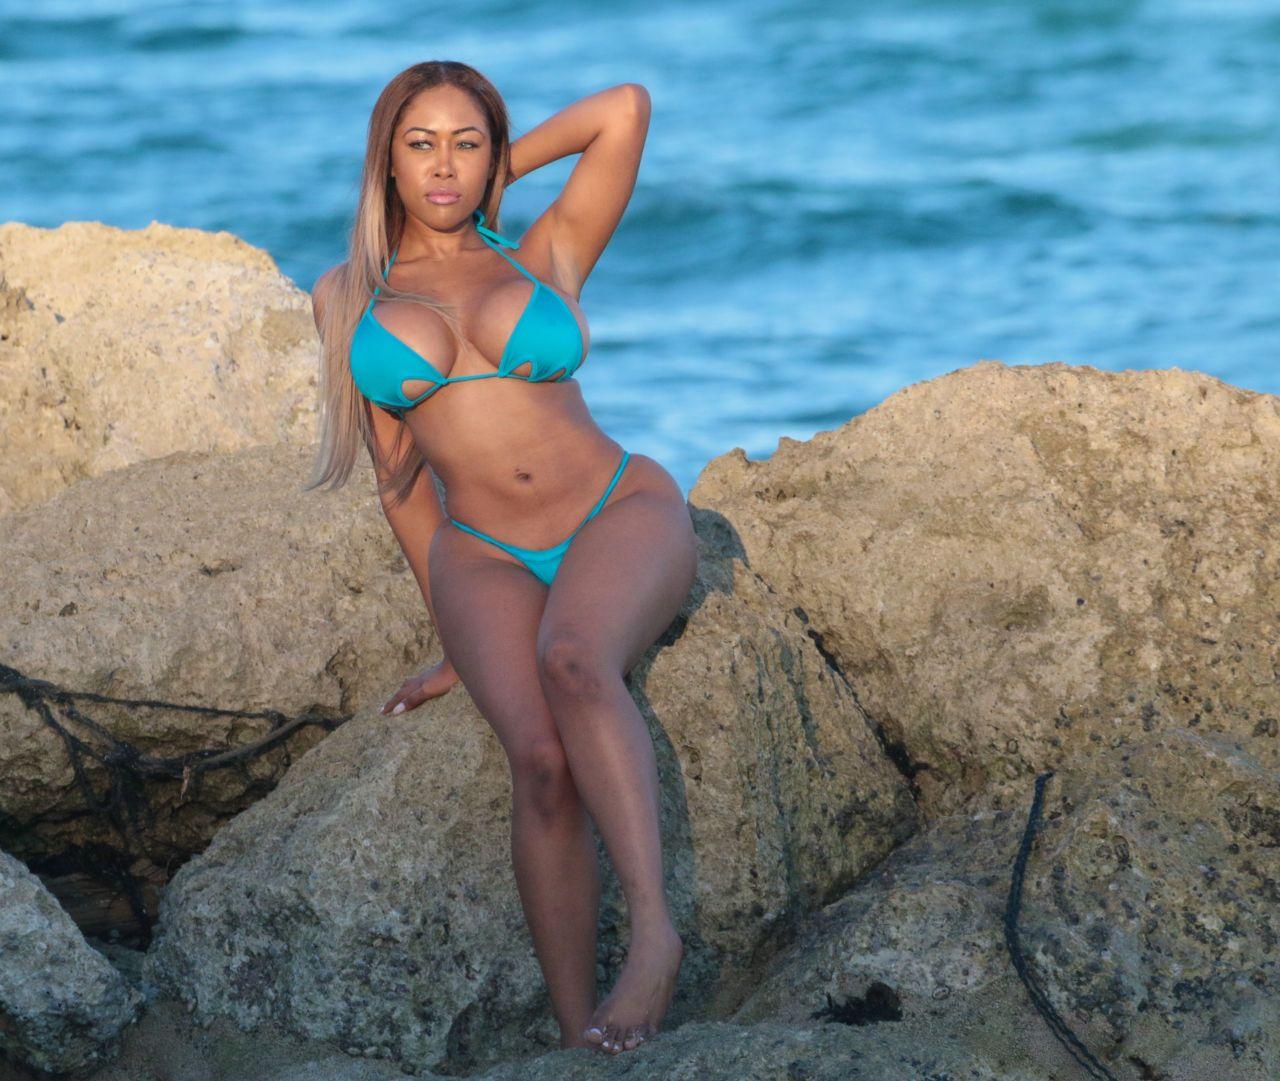 Moriah Mills in Bikini Photoshoot on the beach in Miami Pic 30 of 35